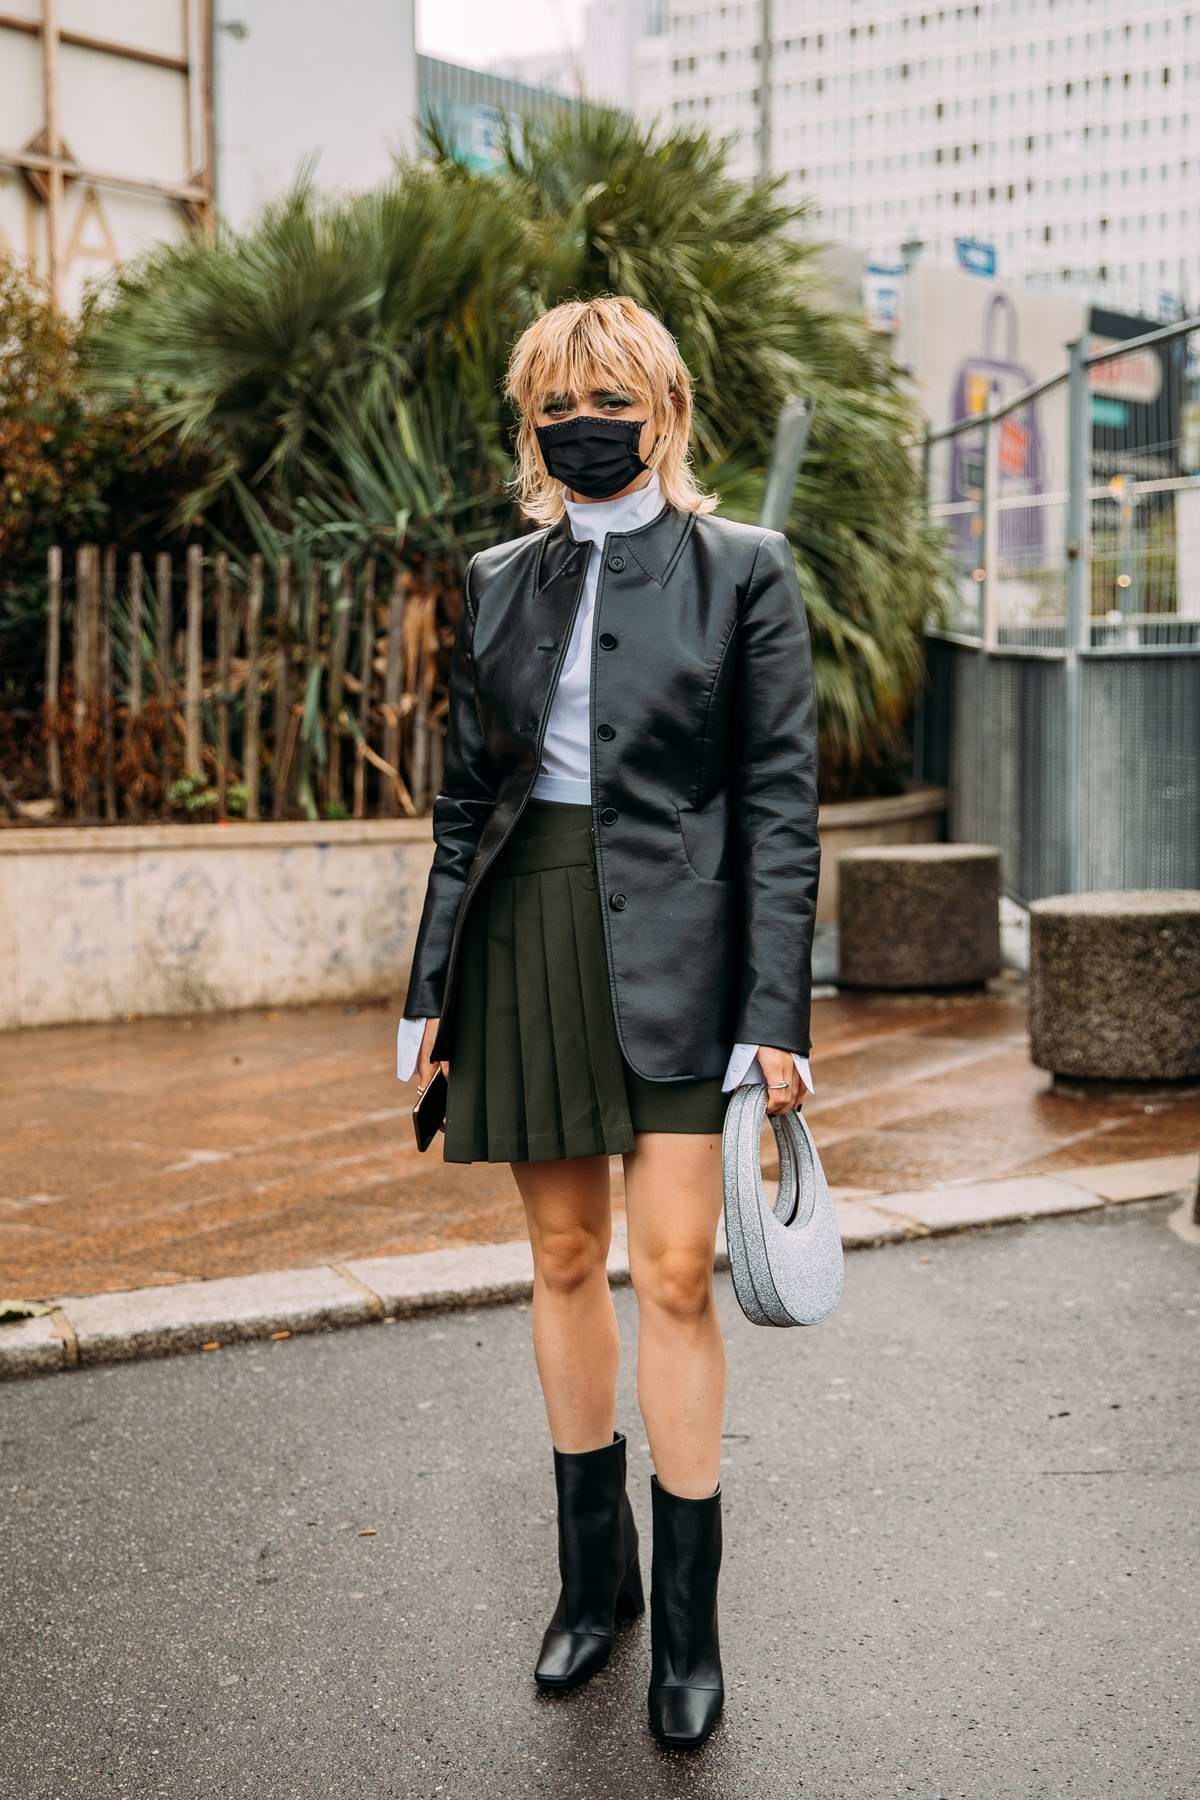 Maisie Williams attends the Coperni Womenswear Spring-Summer 2021 show during Paris Fashion Week in Paris, France